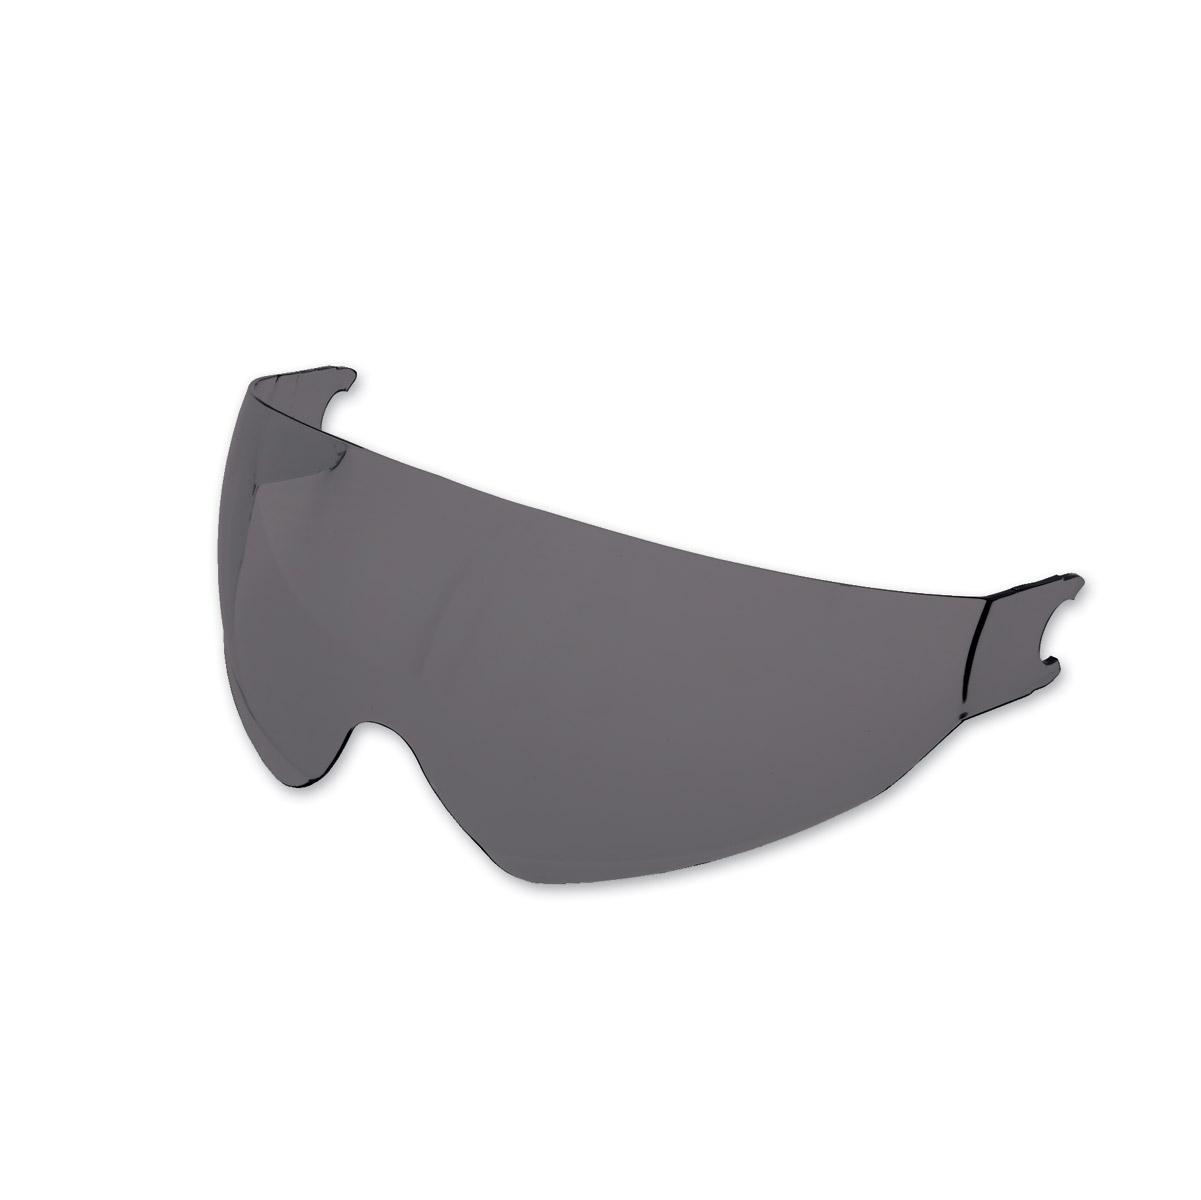 Zox Dark Smoke Replacement Inner Shield for Brigade/Condor/Sierra Helmets